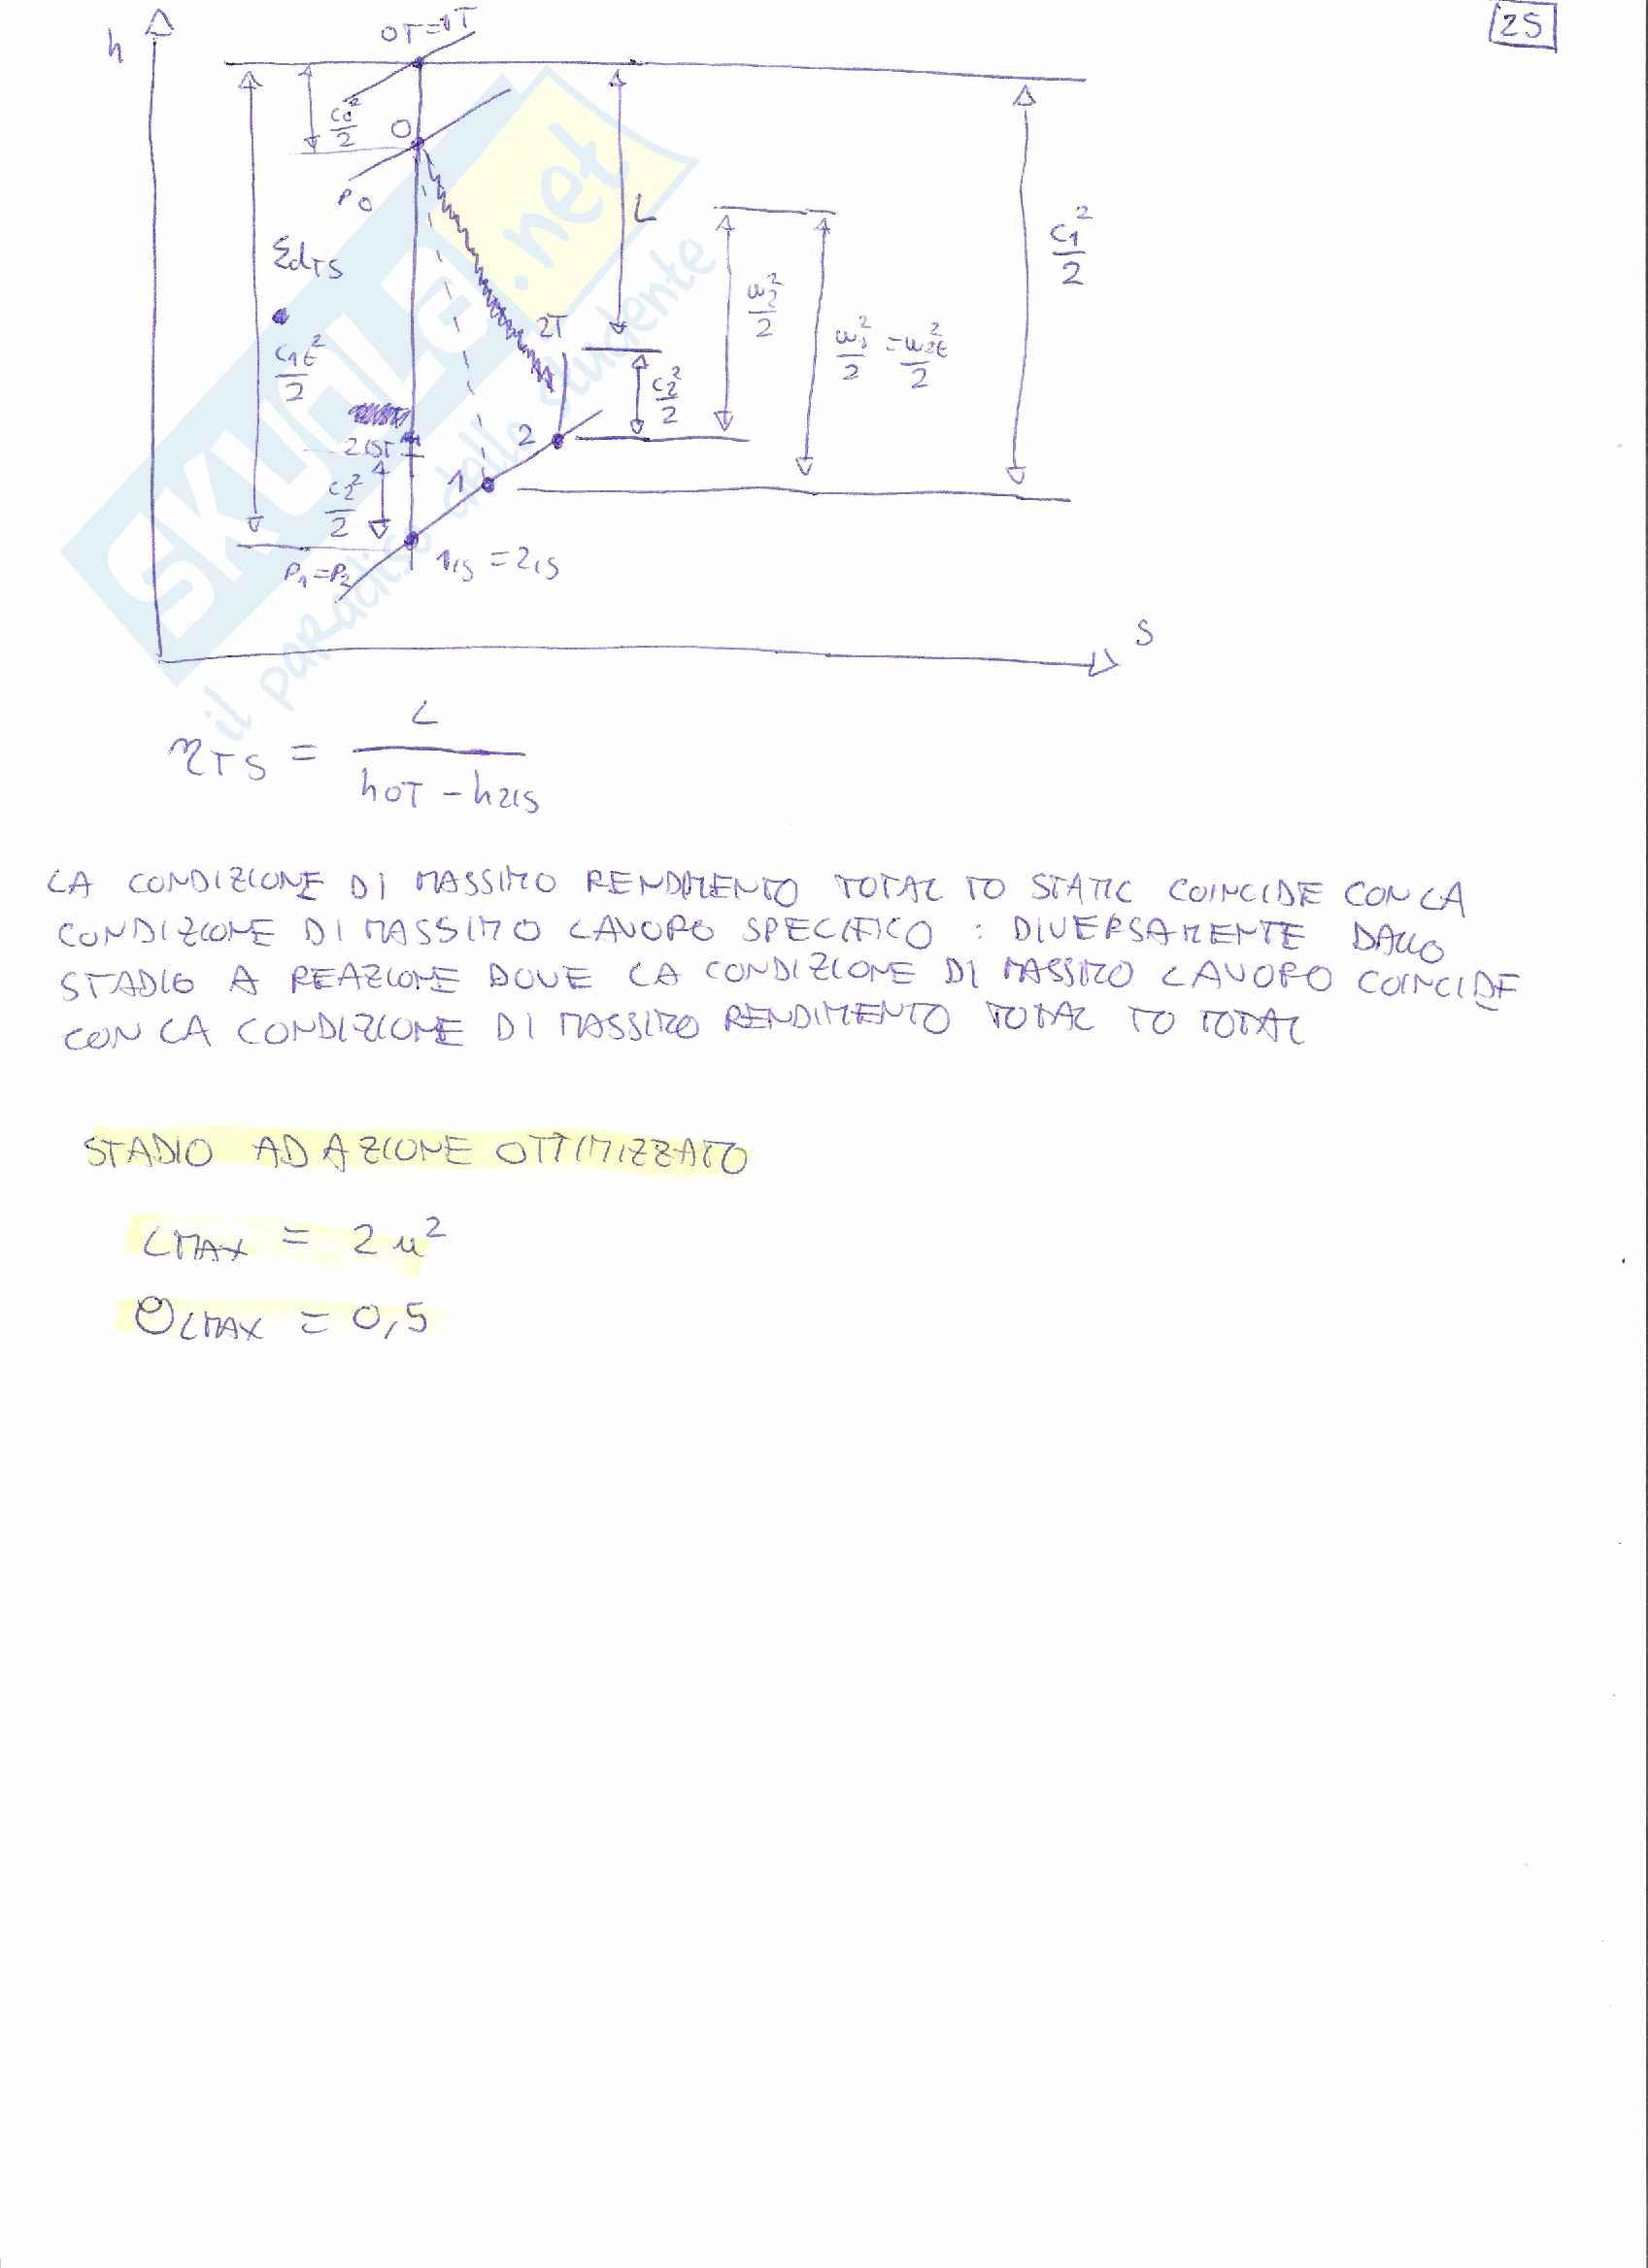 Sistemi Energetici T - Appunti Pag. 51